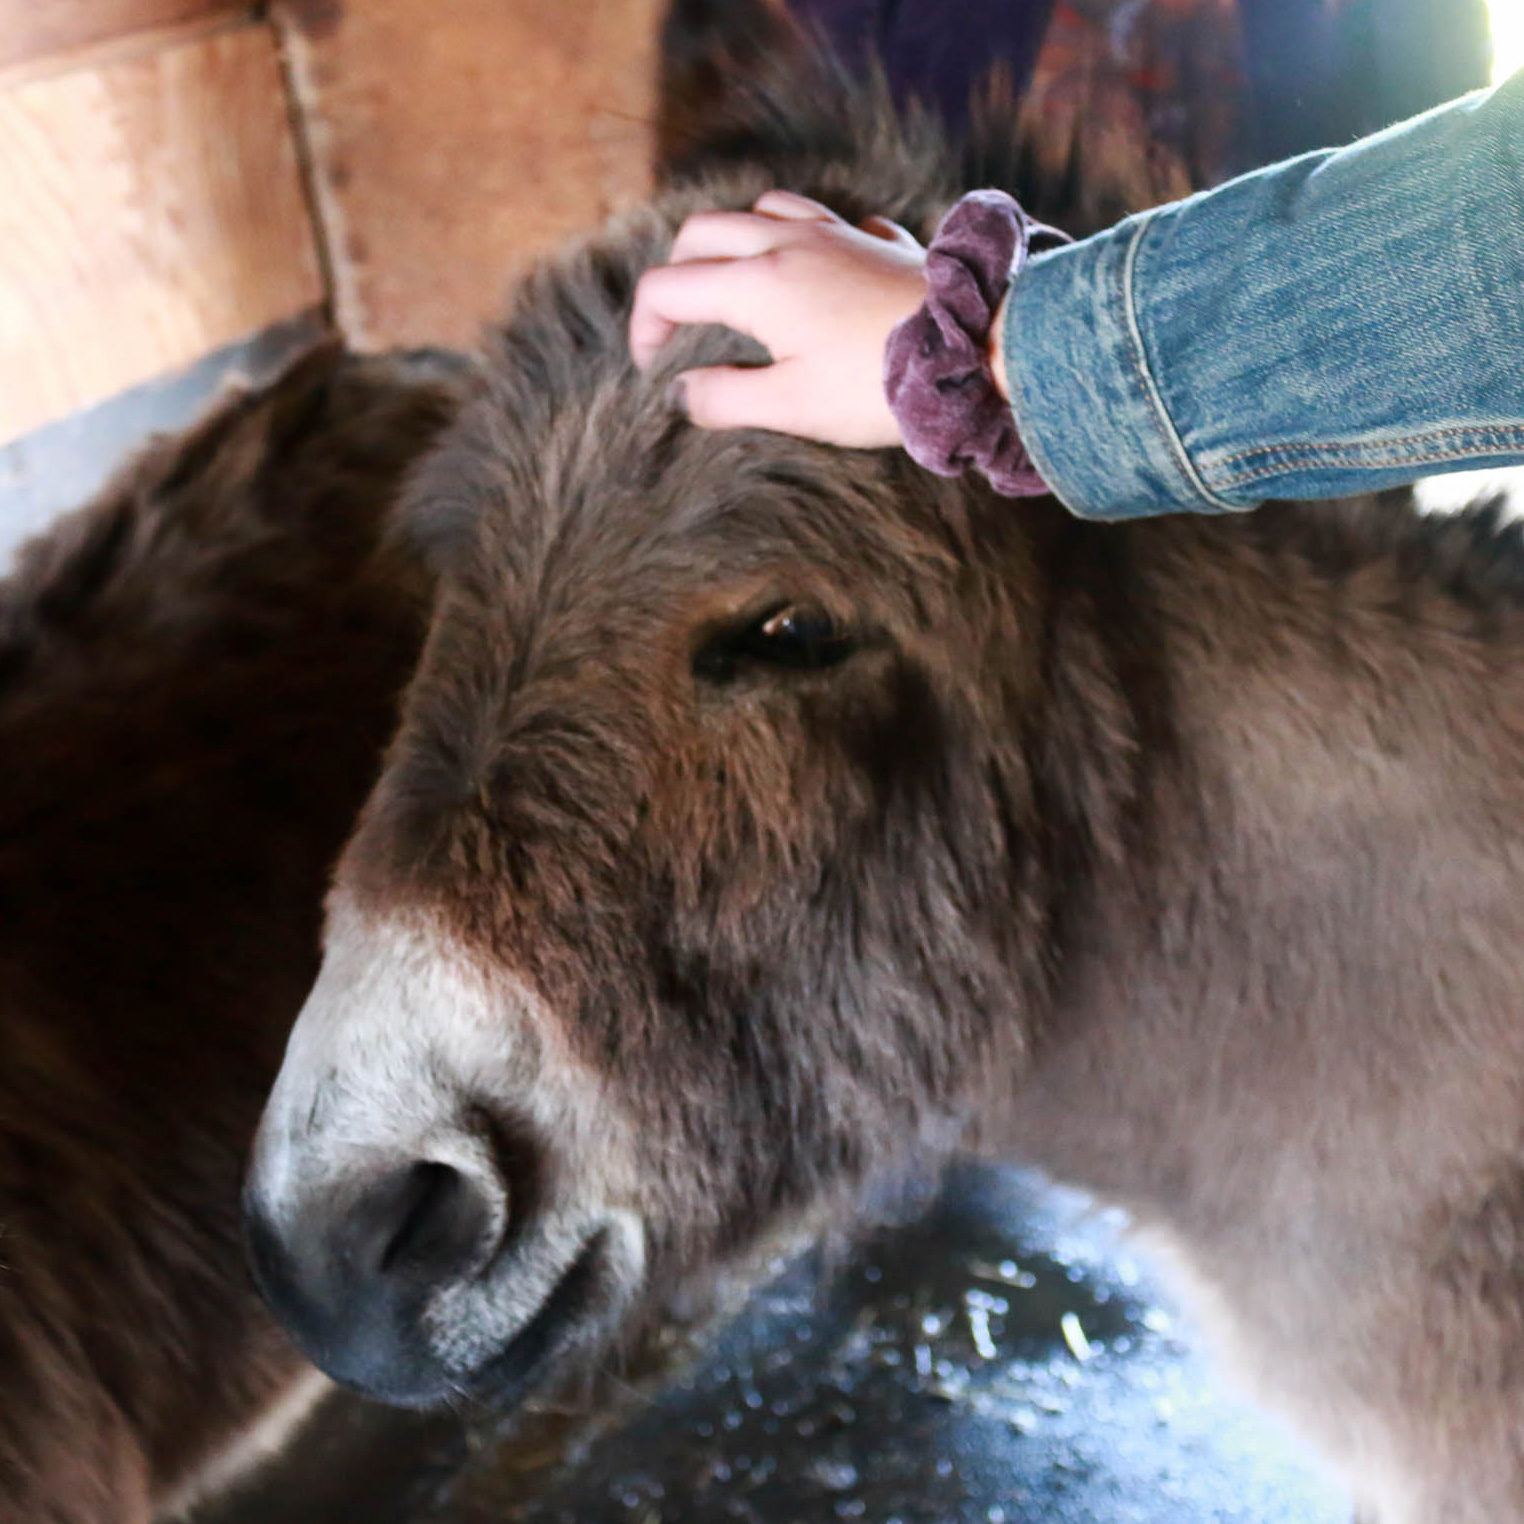 Izzy, a miniature donkey in Waterloo, IA.